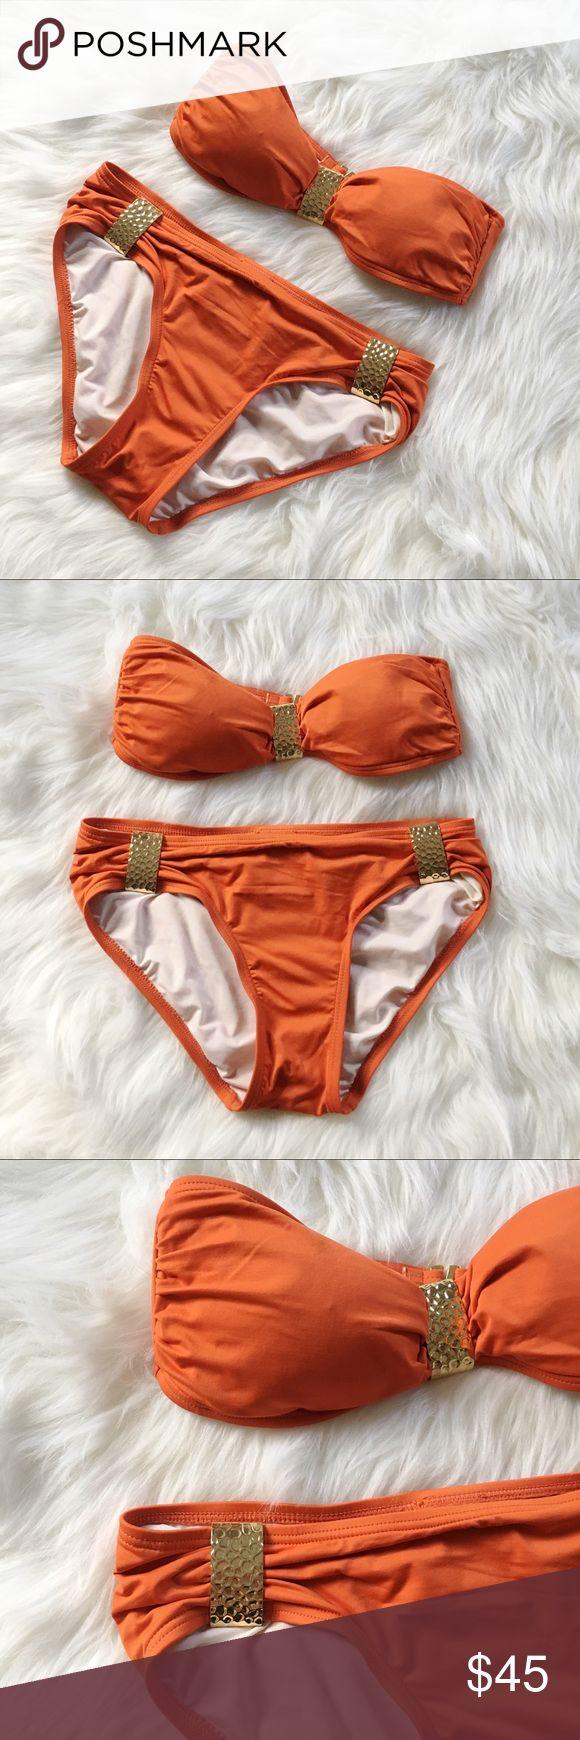 Michael Kors Strapless Orange Bikini Good condition - slight pilling at bottom of suit. Only worn once! Michael Kors Strapless Orange Bikini. Stylish gold hardware. Size PS [petite small]. No modeling/trades. Michael Kors Swim Bikinis